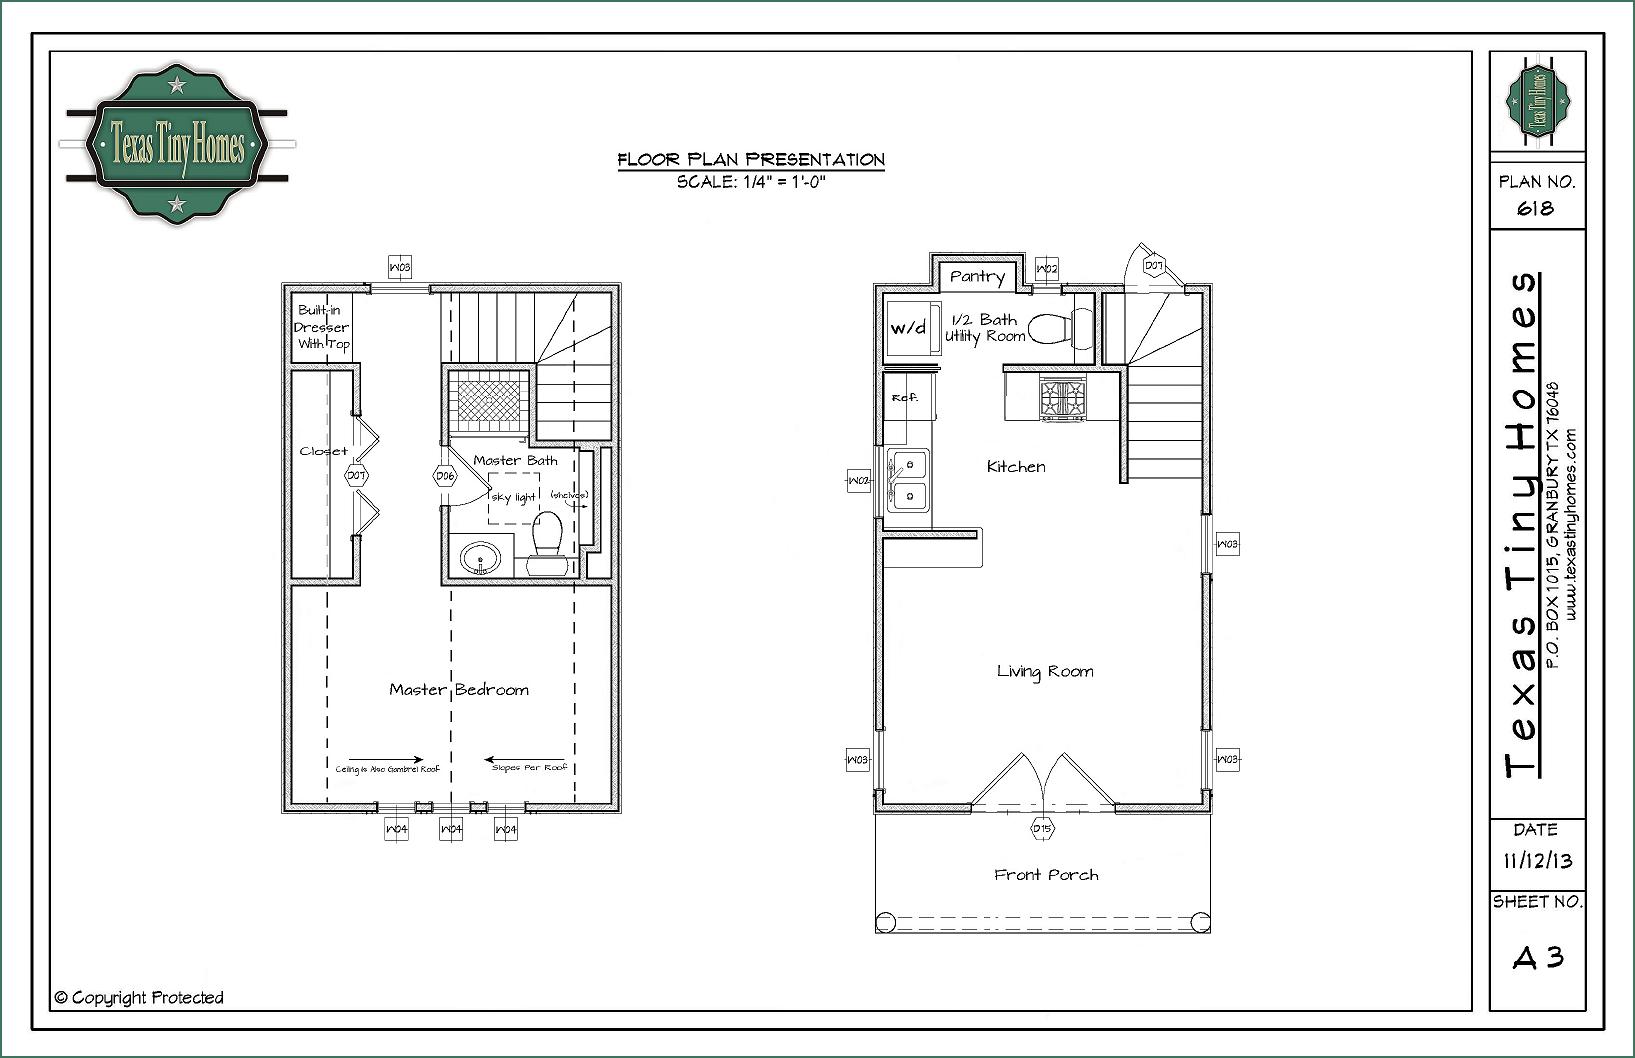 Texas Tiny Homes Plan 618